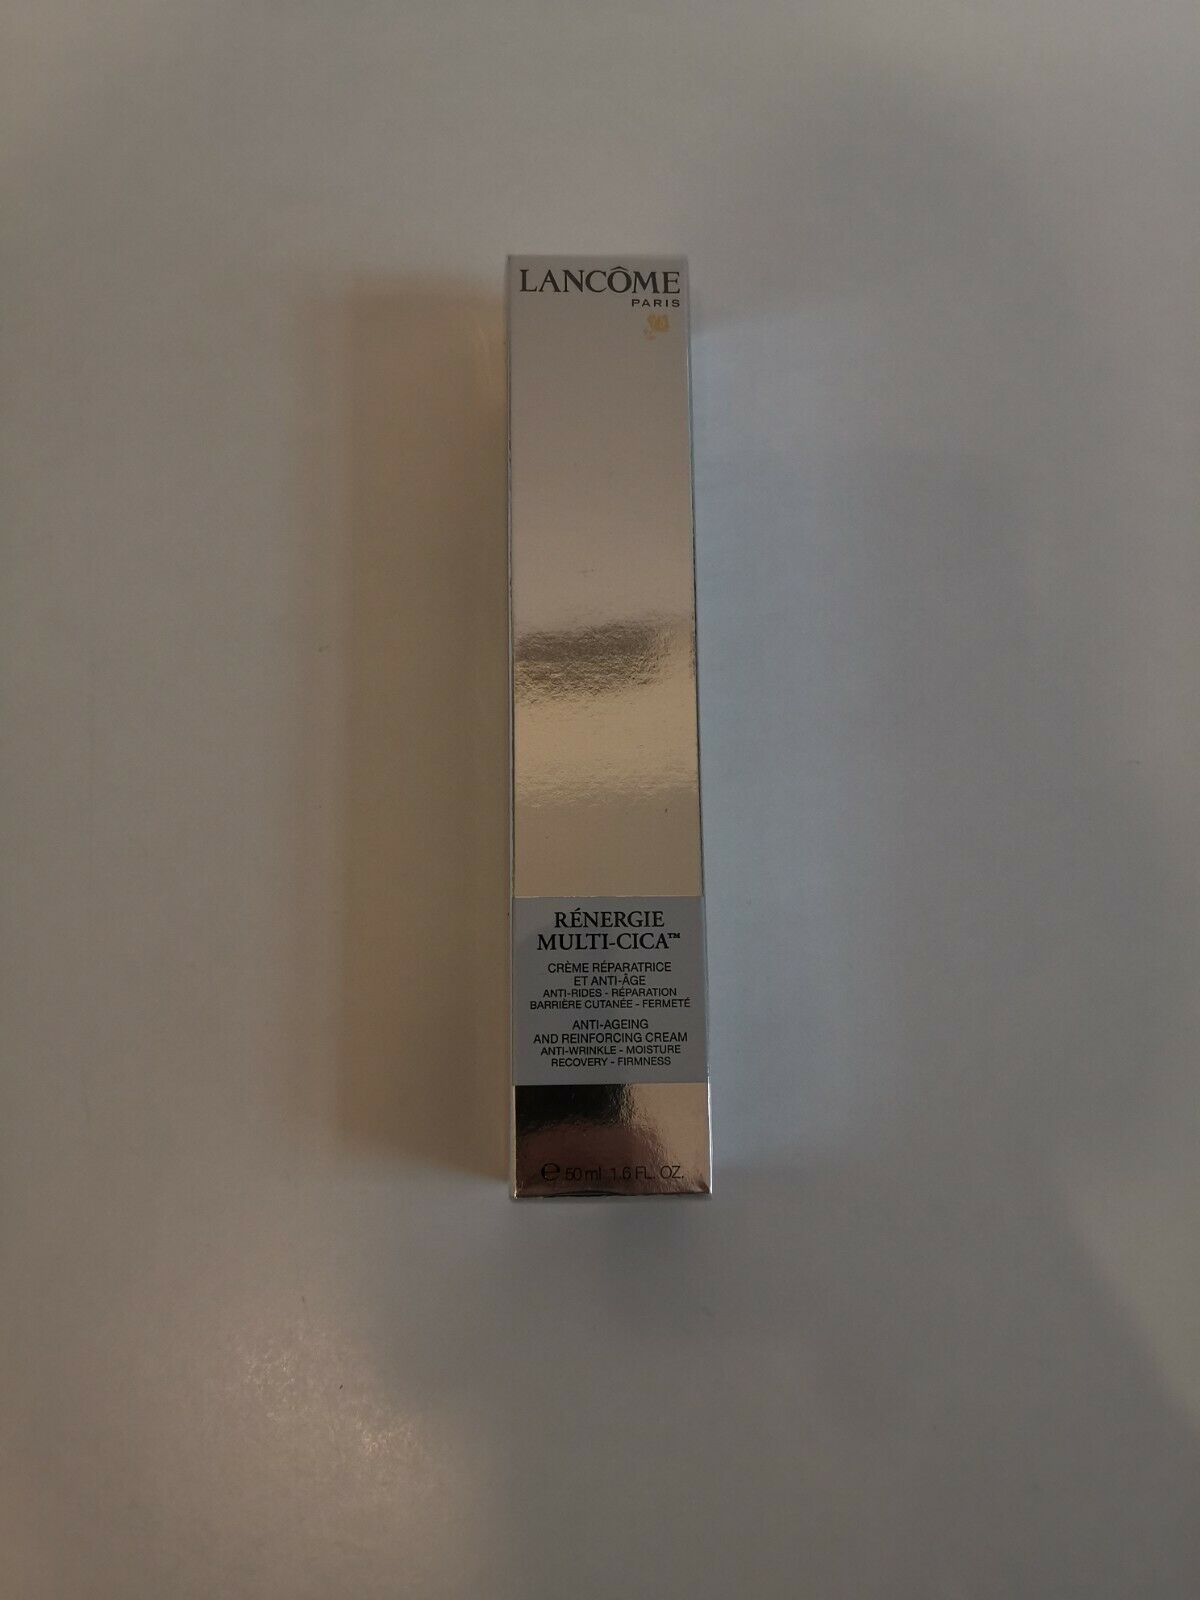 Lancôme Rénergie Multi-cica; Stärkende Anti-Aging Creme; 50 ml; NEU + OVP